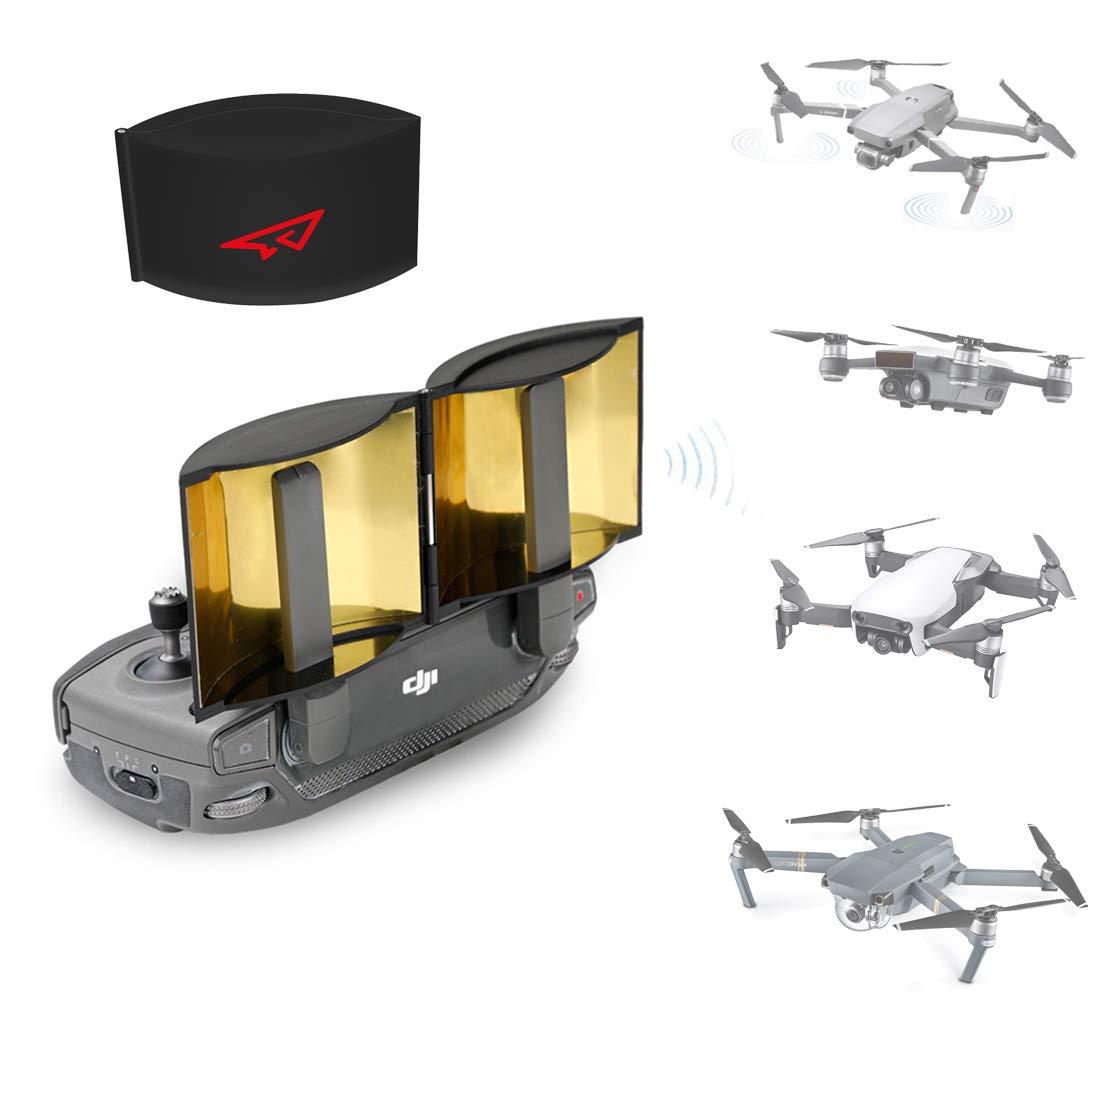 Rcgeek Drone Range Extender Amplificador De Señal Antena Plegable Compatible Con Dji Mavic Pro Mavic 2 Pro / Zoom Mavic